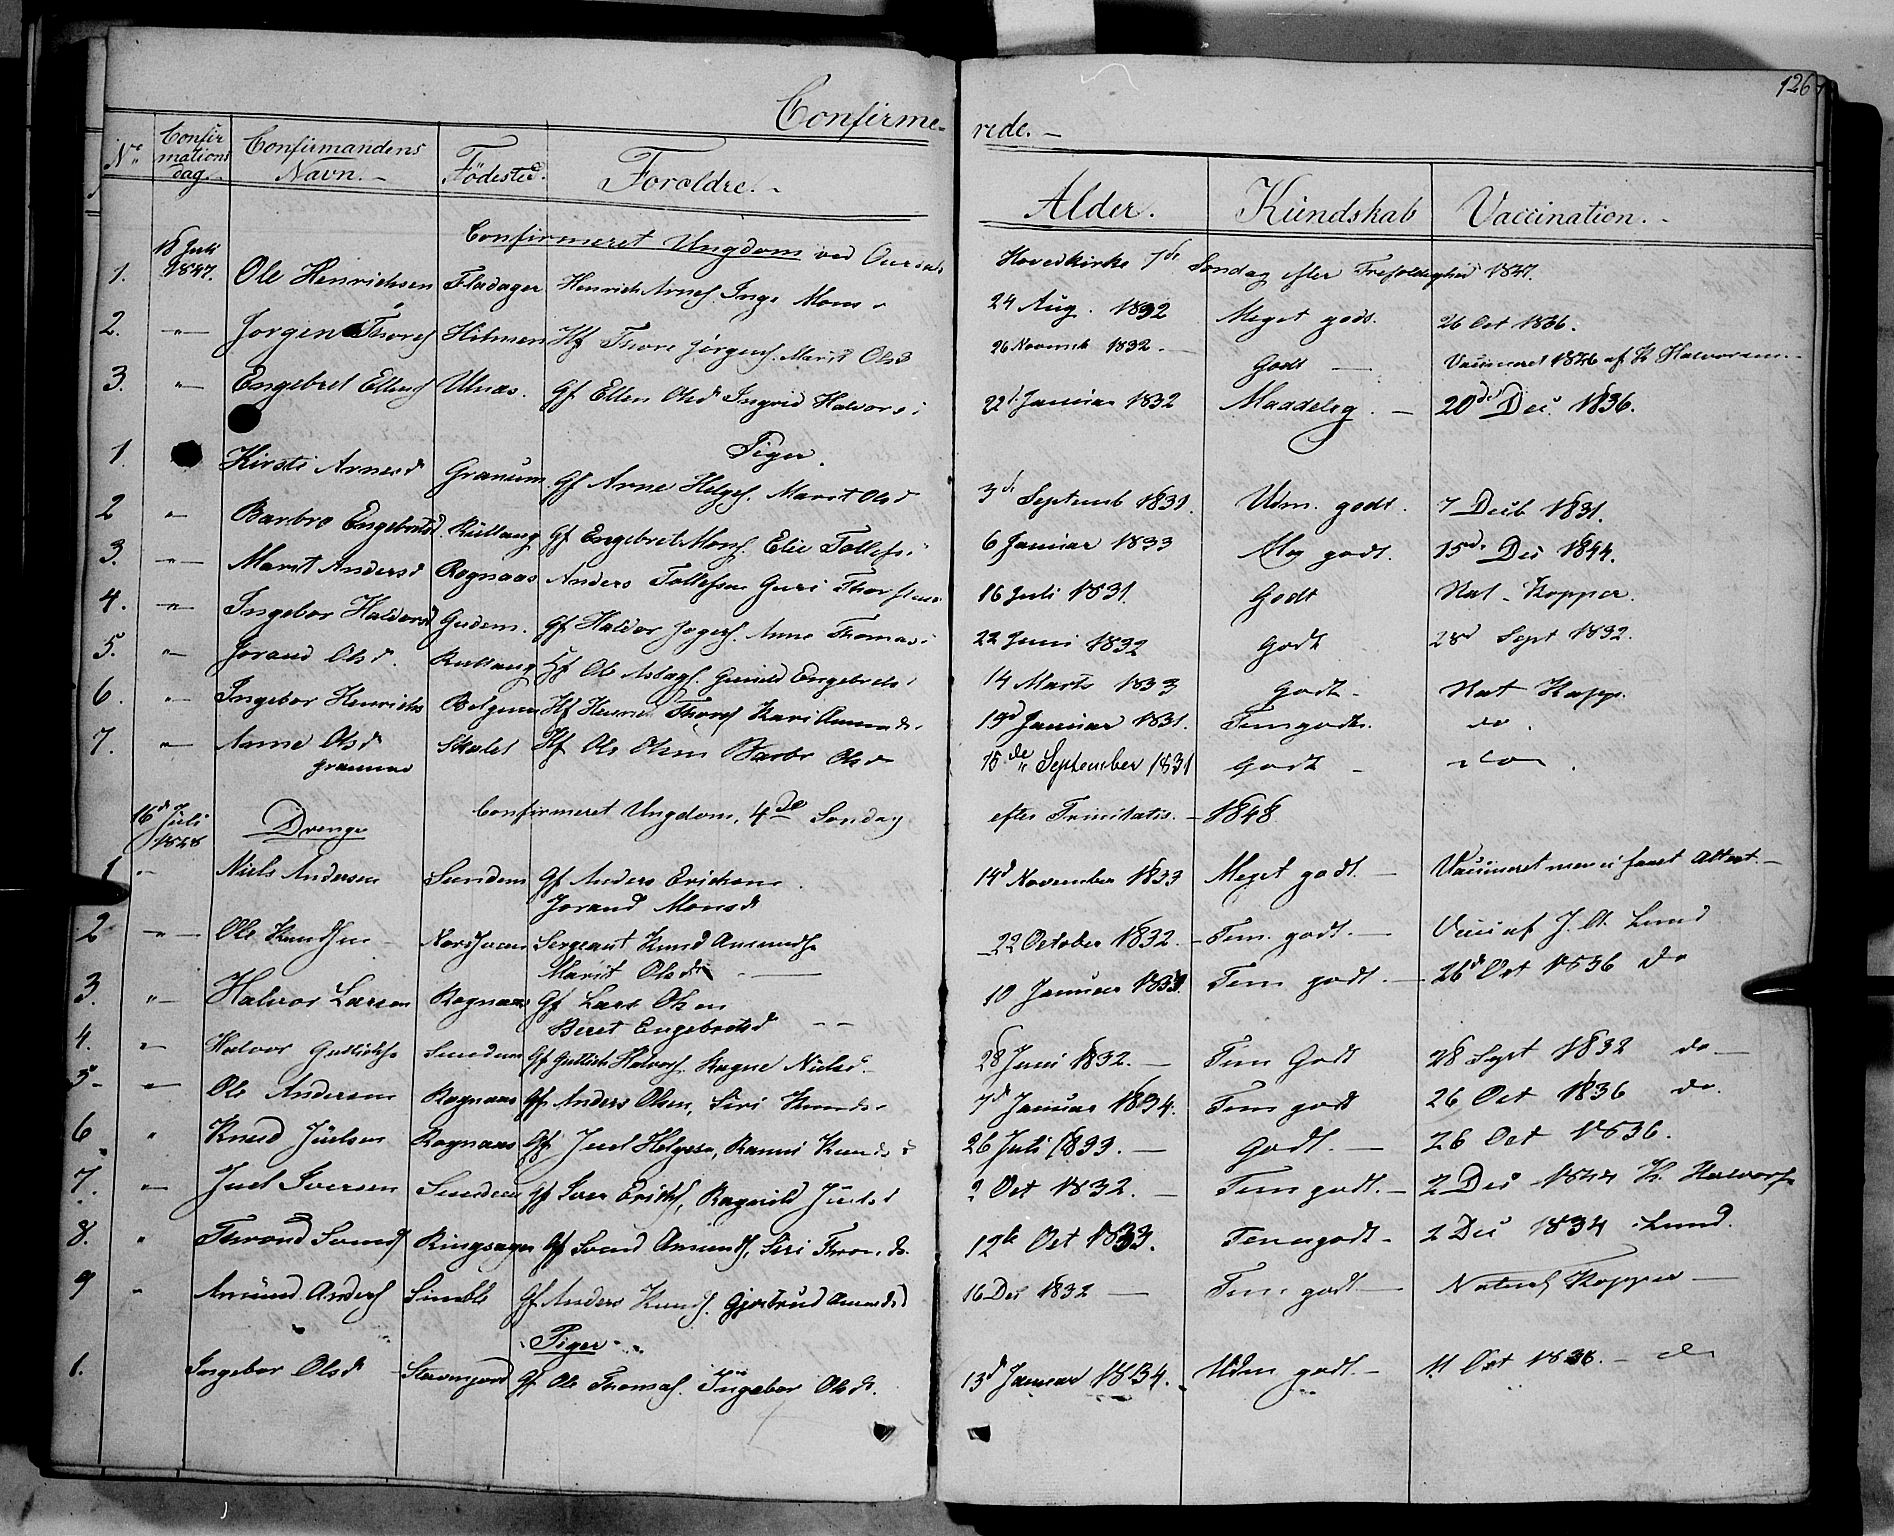 SAH, Nord-Aurdal prestekontor, Ministerialbok nr. 6, 1842-1863, s. 126